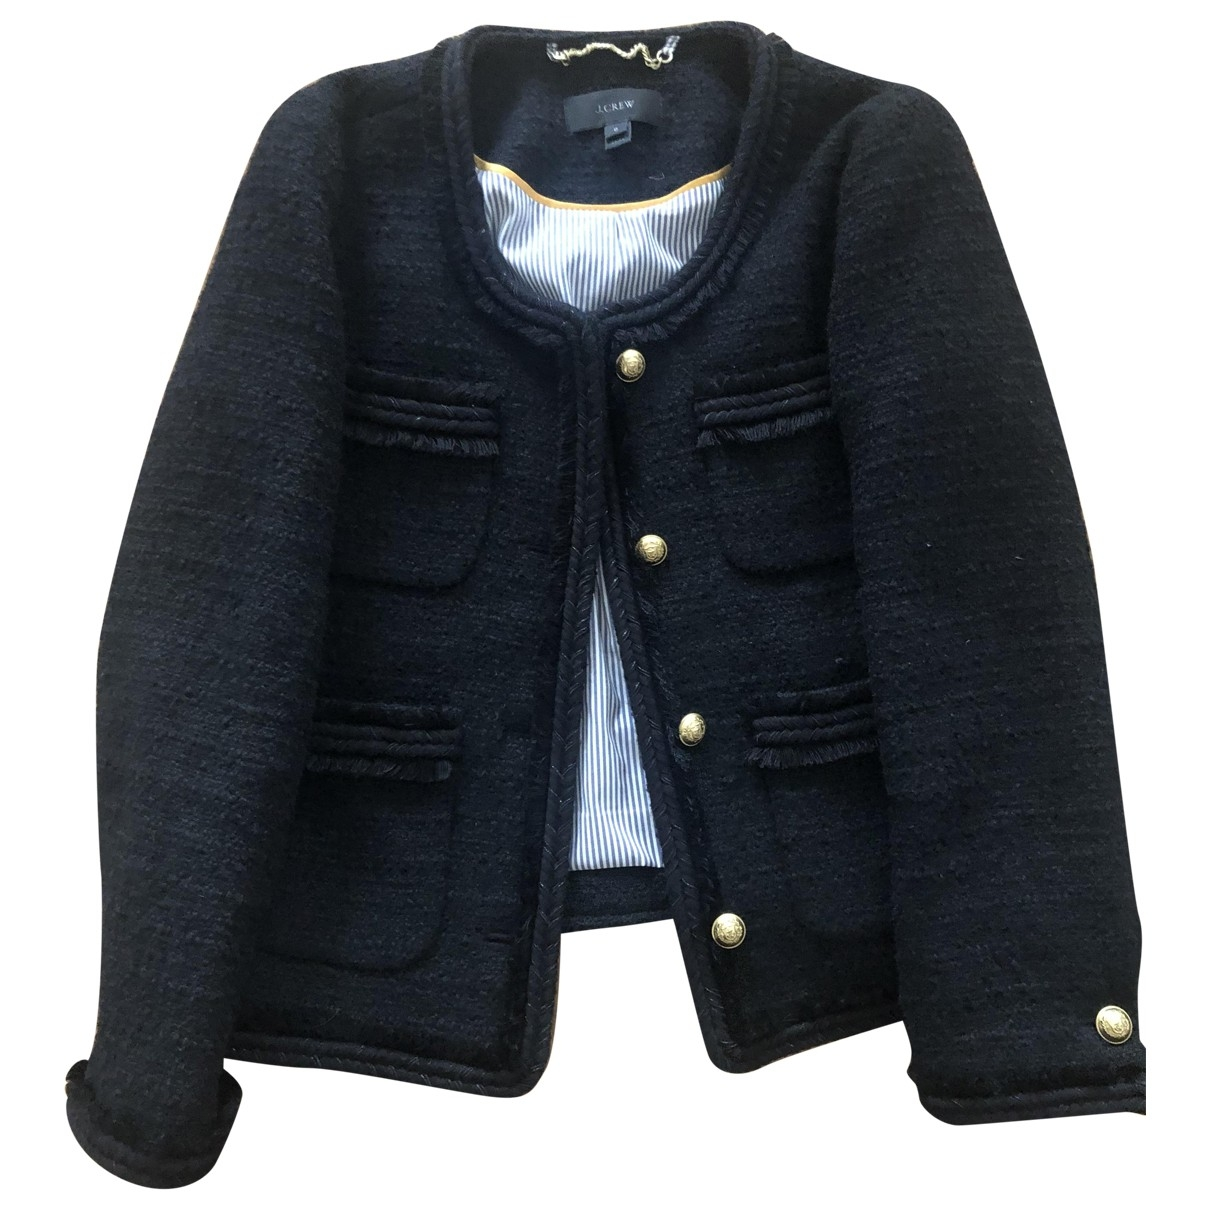 J.crew \N Navy Tweed jacket for Women 0 0-5